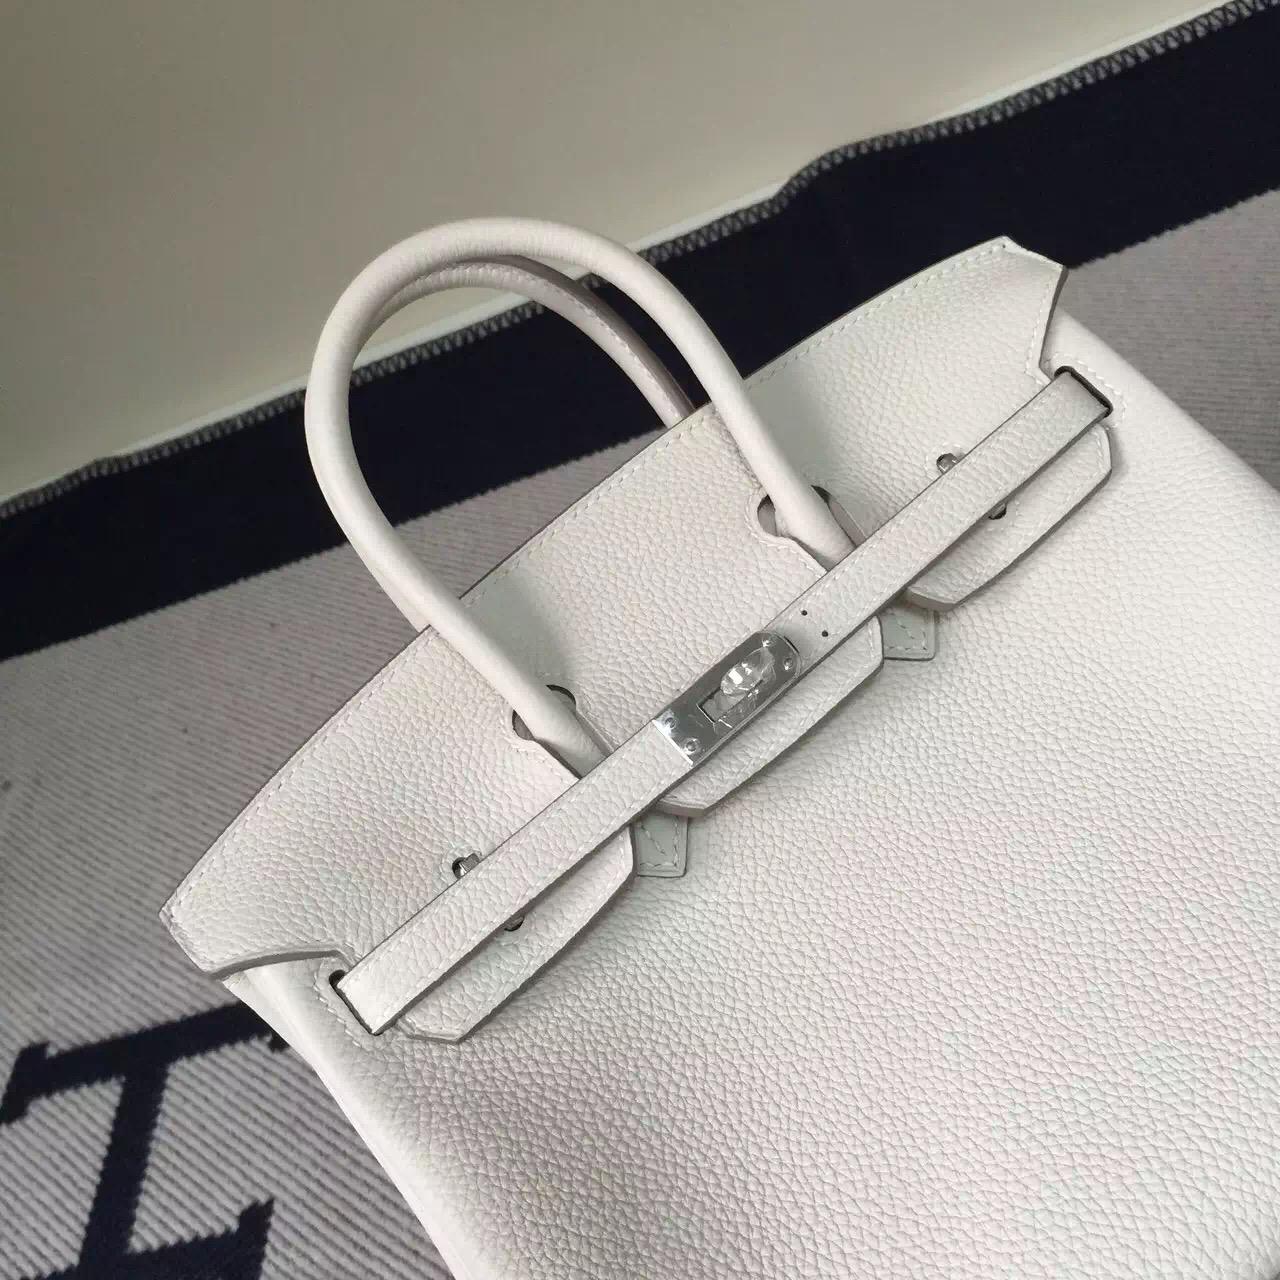 New Women's Bag Hermes Togo Leather Birkin Bag 25cm in CK10 Milk White